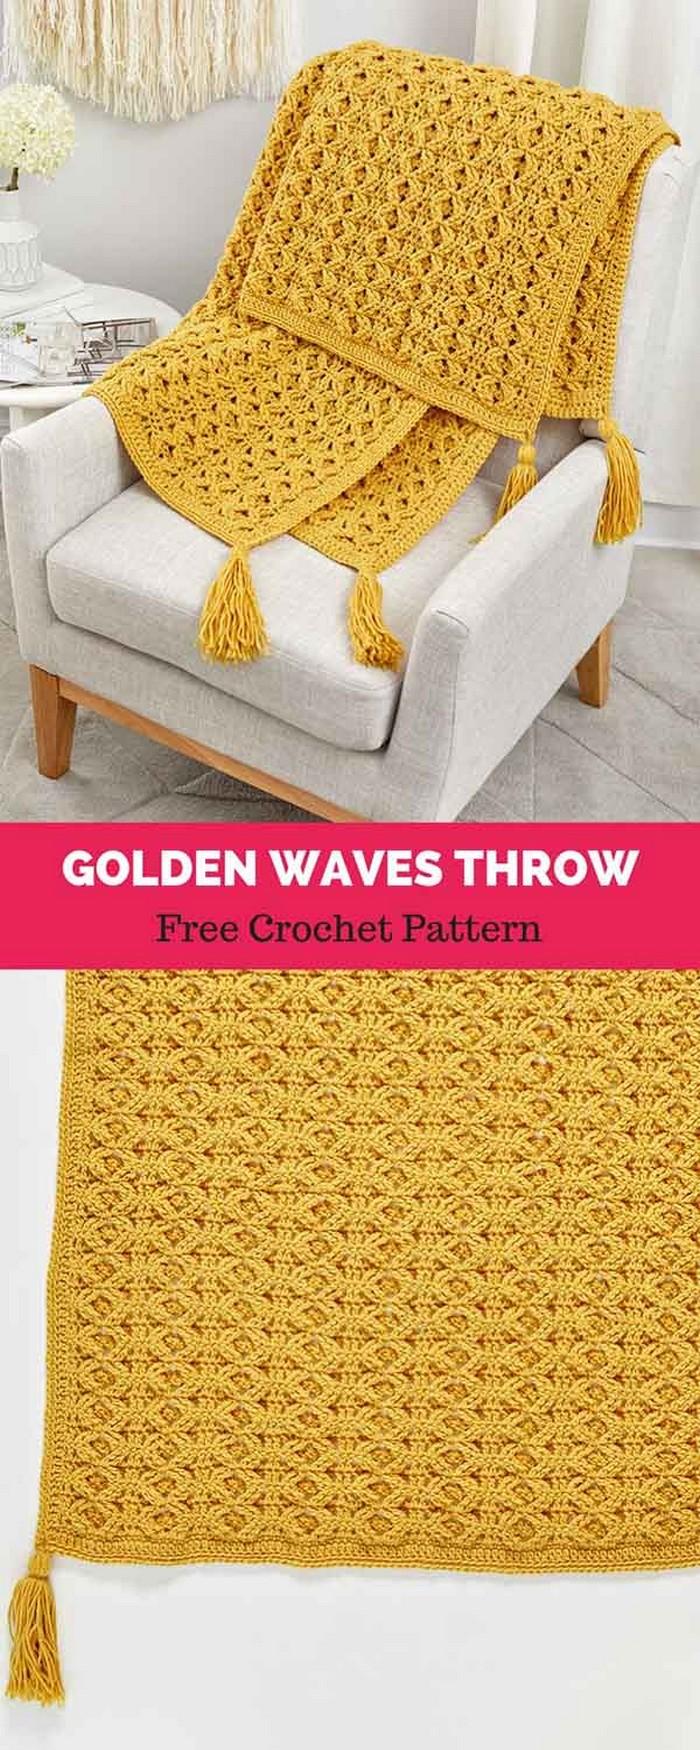 Golden Waves Throw Free Crochet Pattern